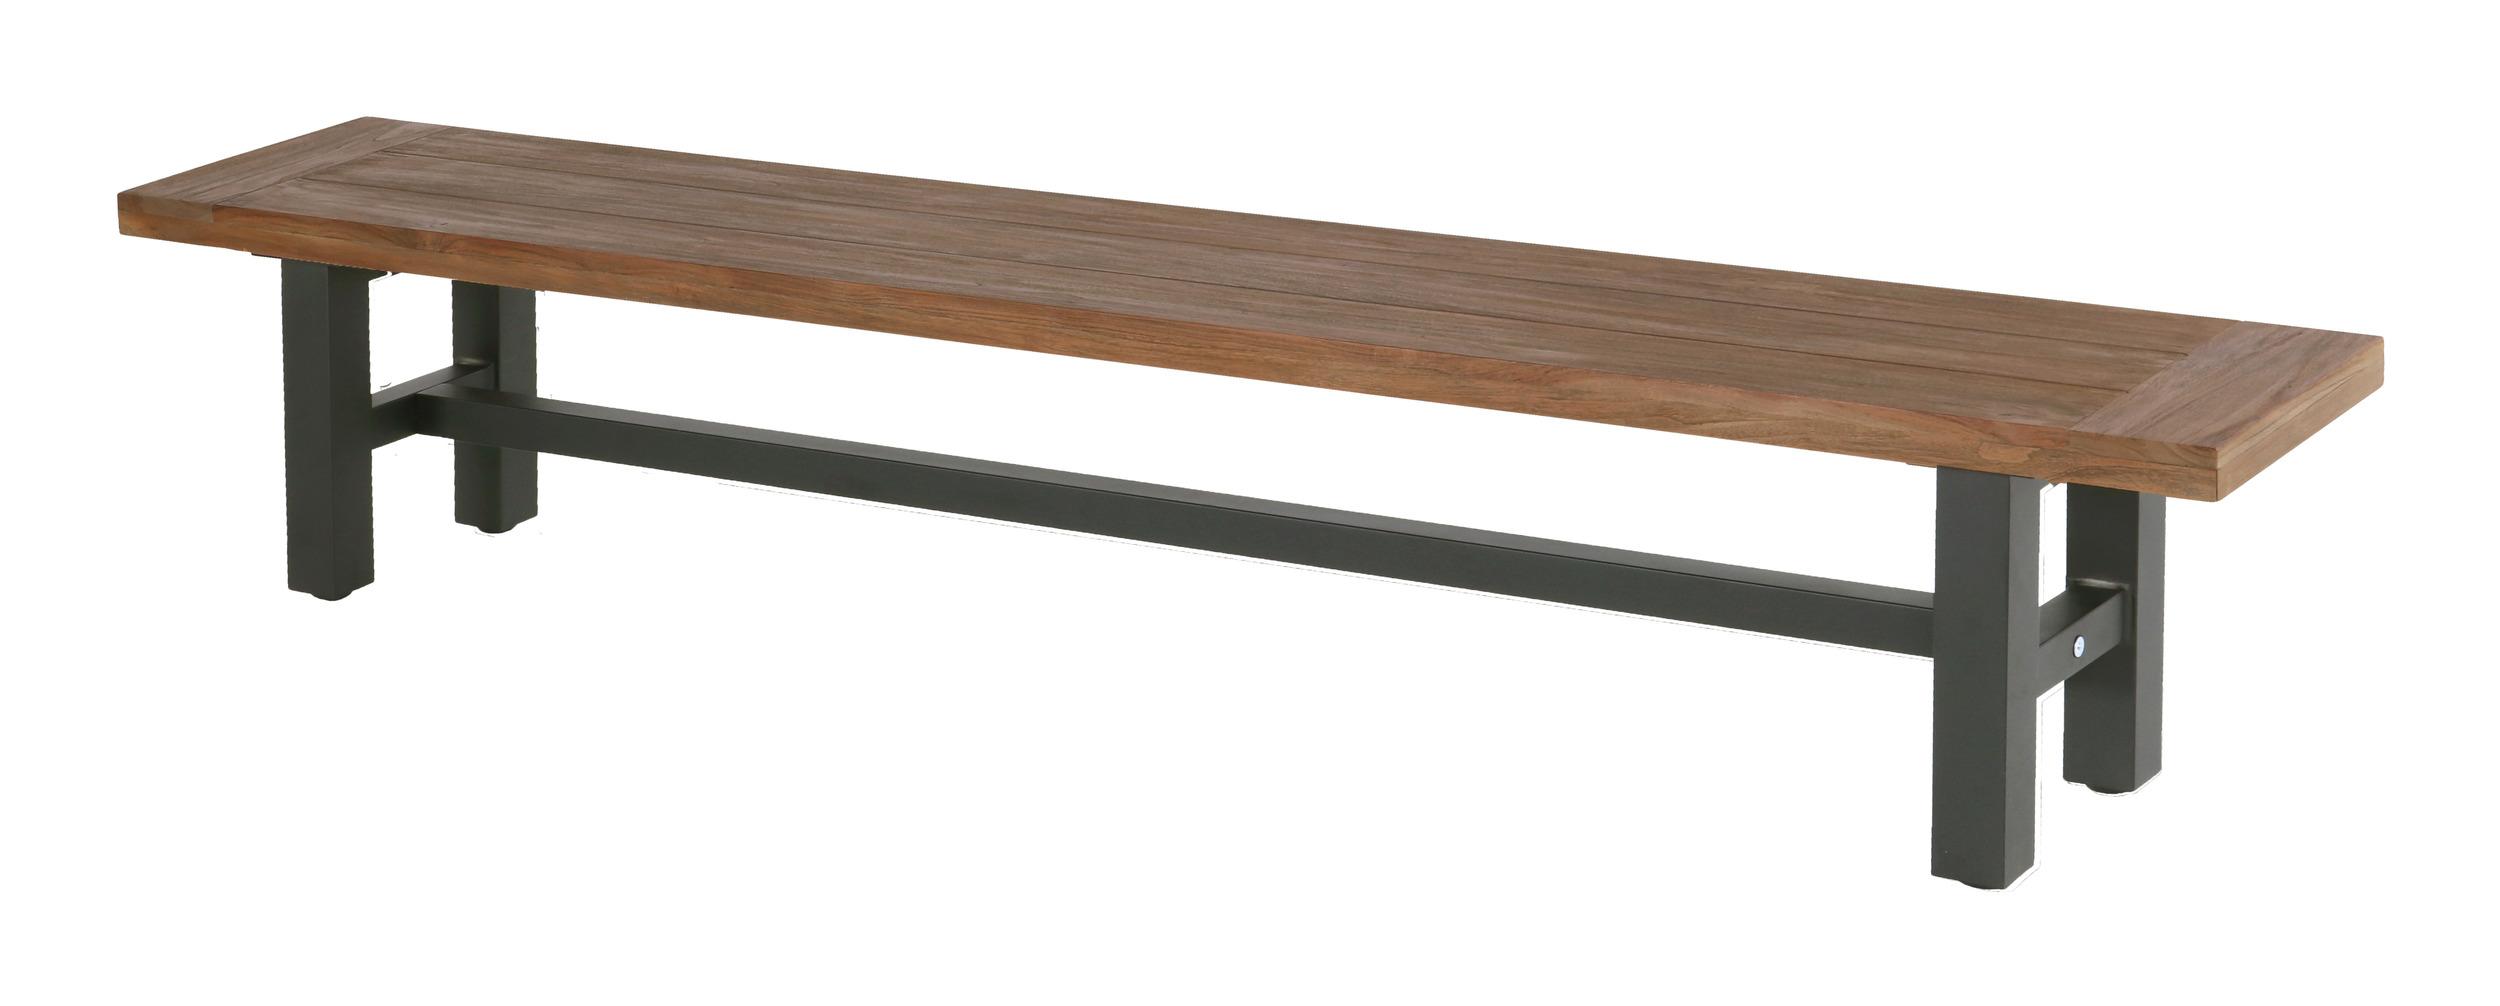 Hartman Tuinbank 'Sophie' 240cm, kleur Antraciet